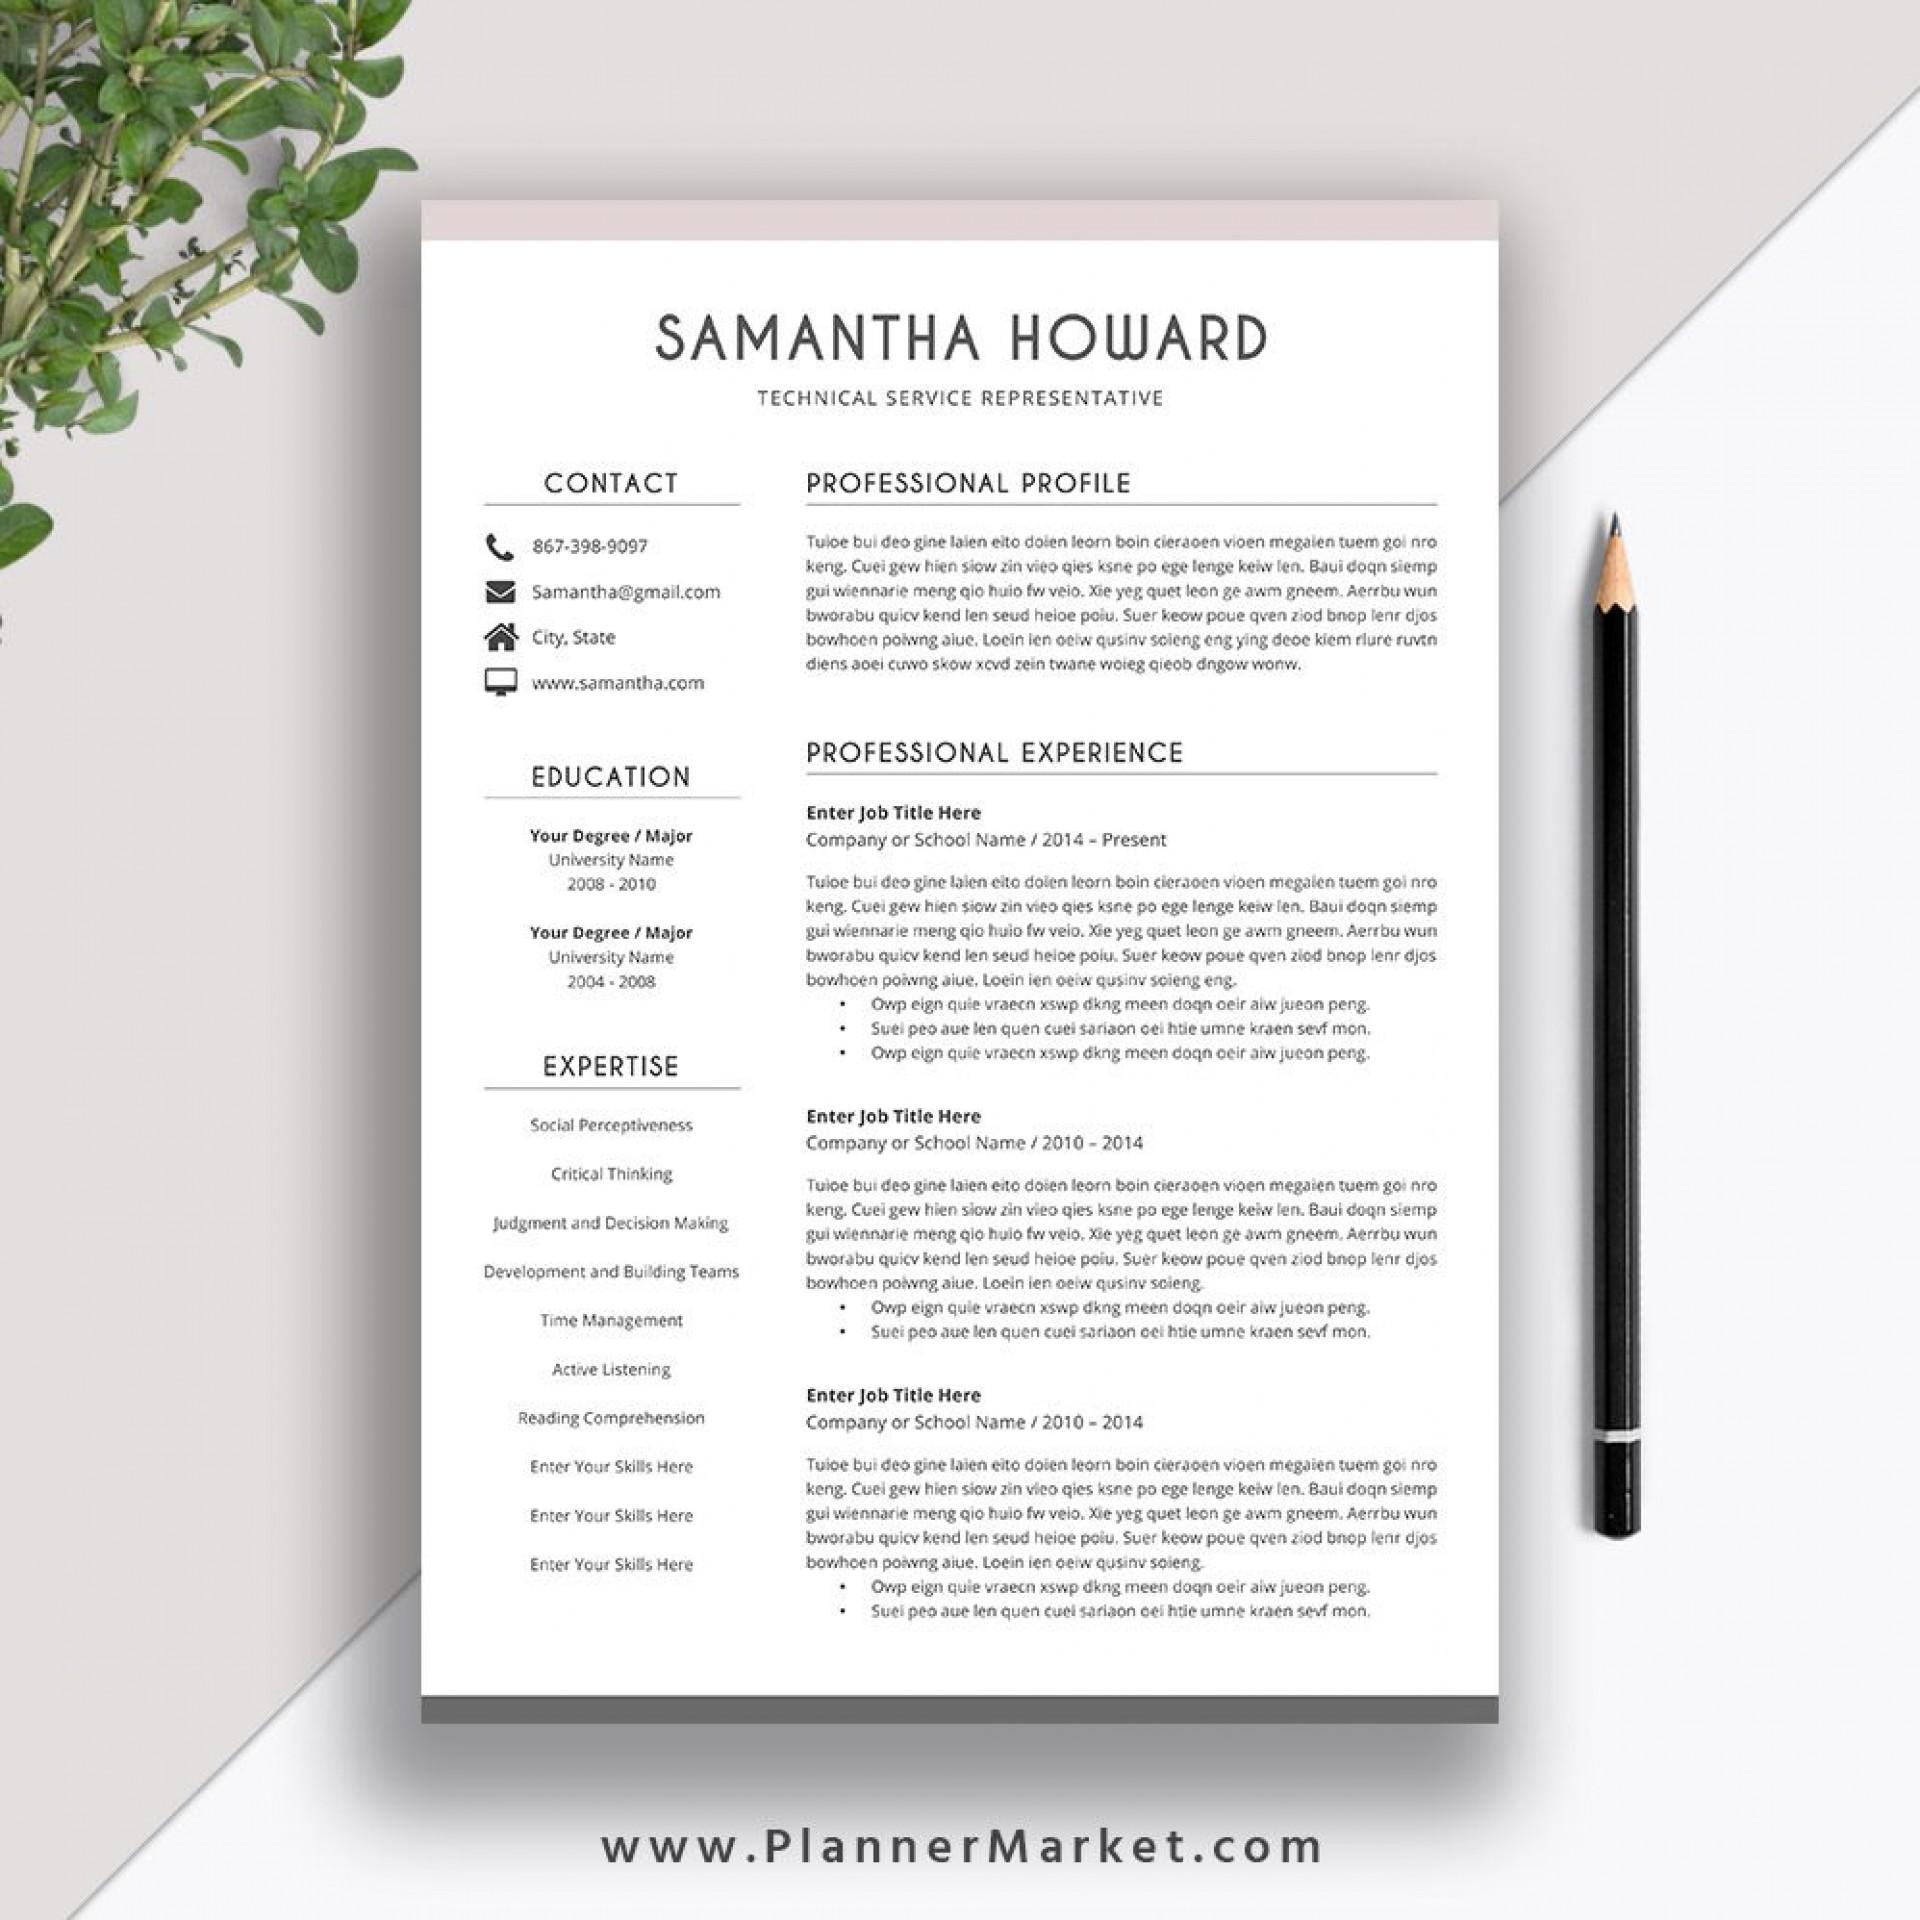 007 Imposing Best Resume Template 2016 Idea 1920